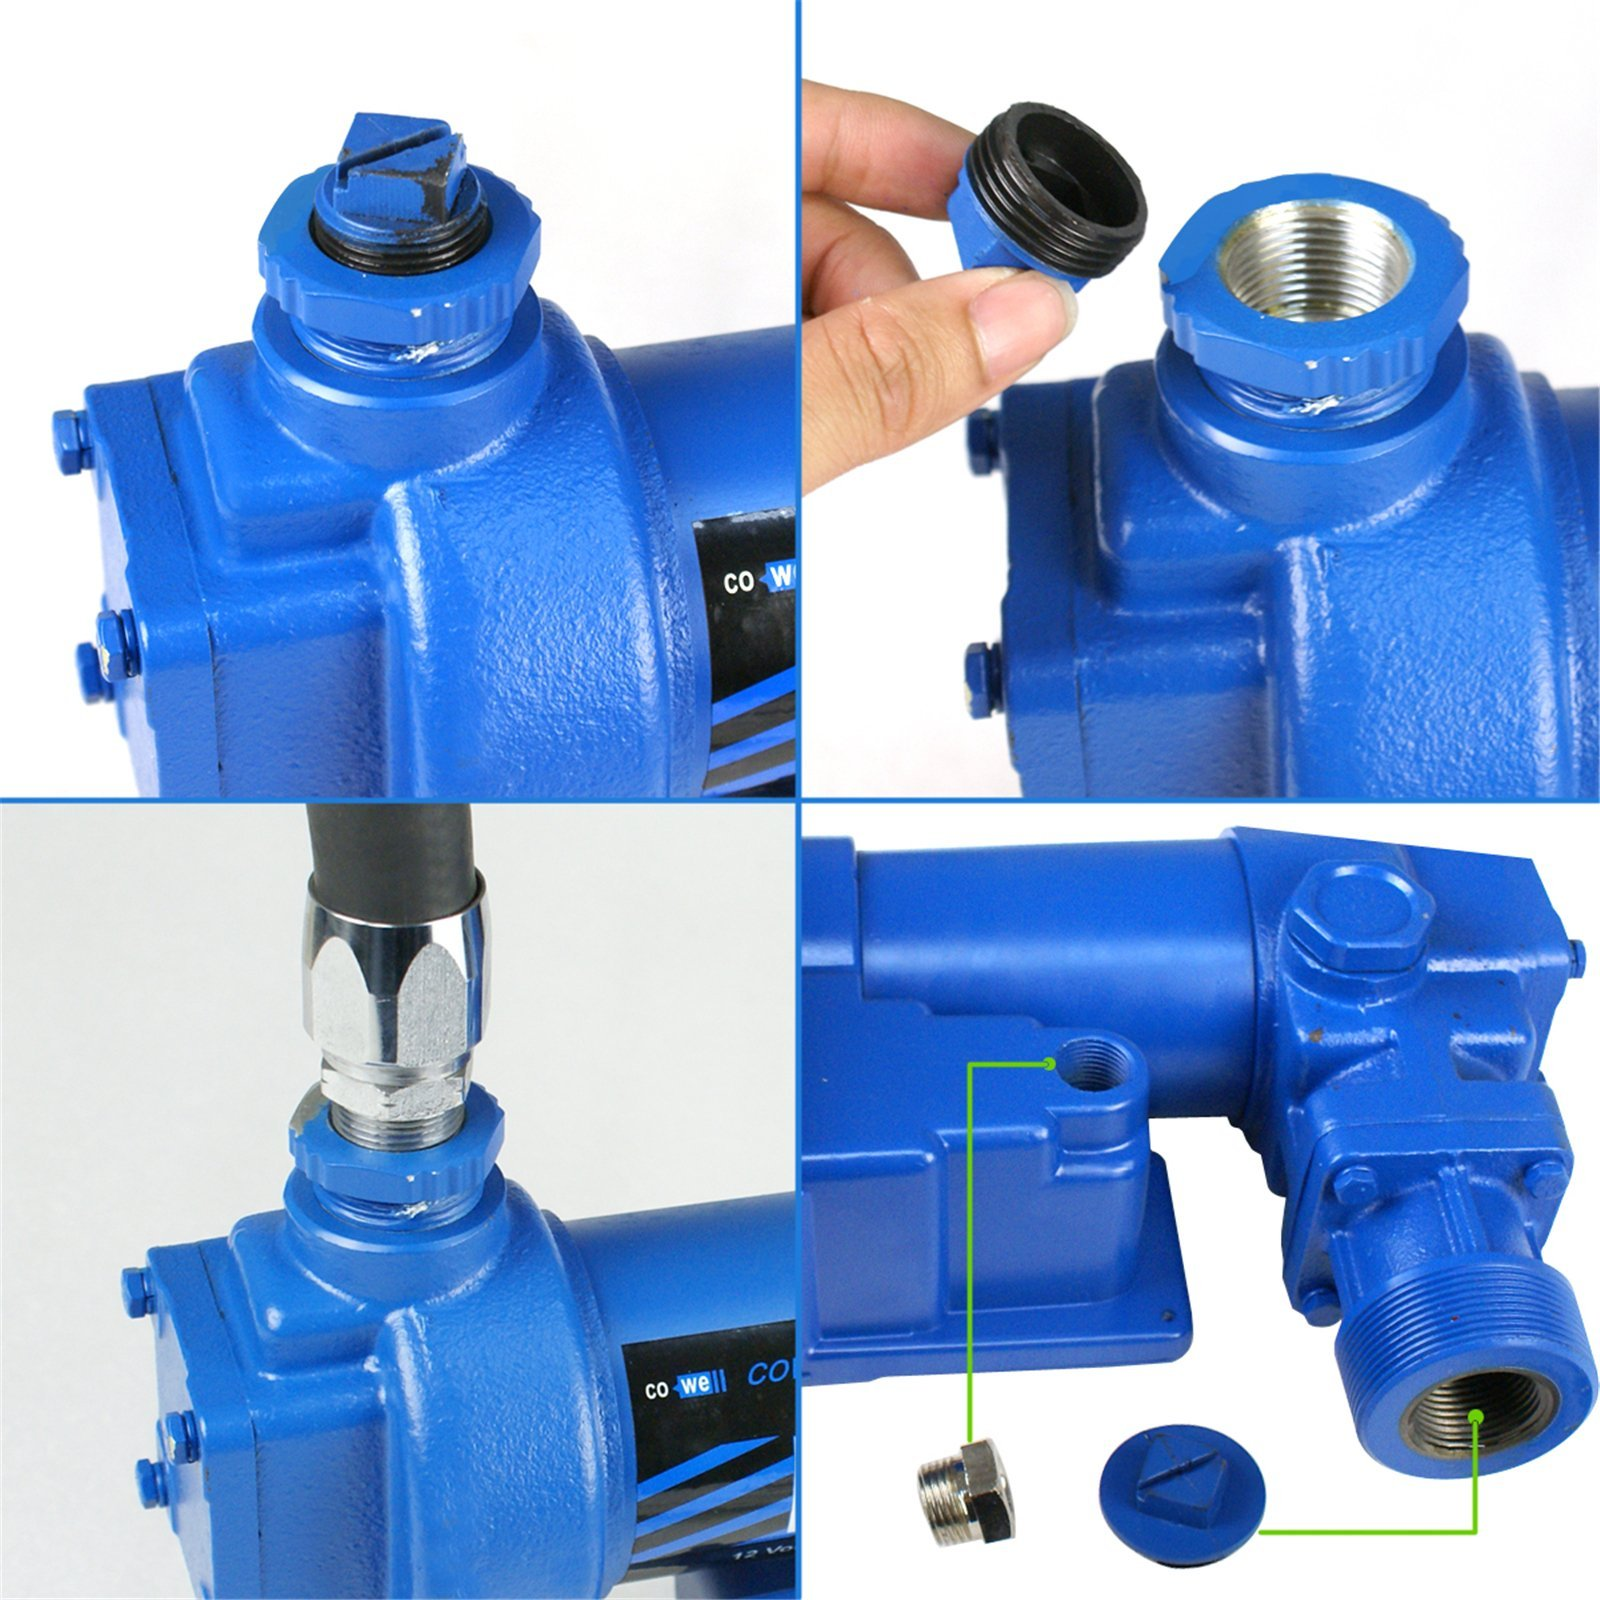 F2C 12 Volt 20GPM Electric Diesel Kerosene Gasoline Fuel Transfer Pump Fillrite Manual Nozzle Hose Kit … Blue by F2C (Image #4)